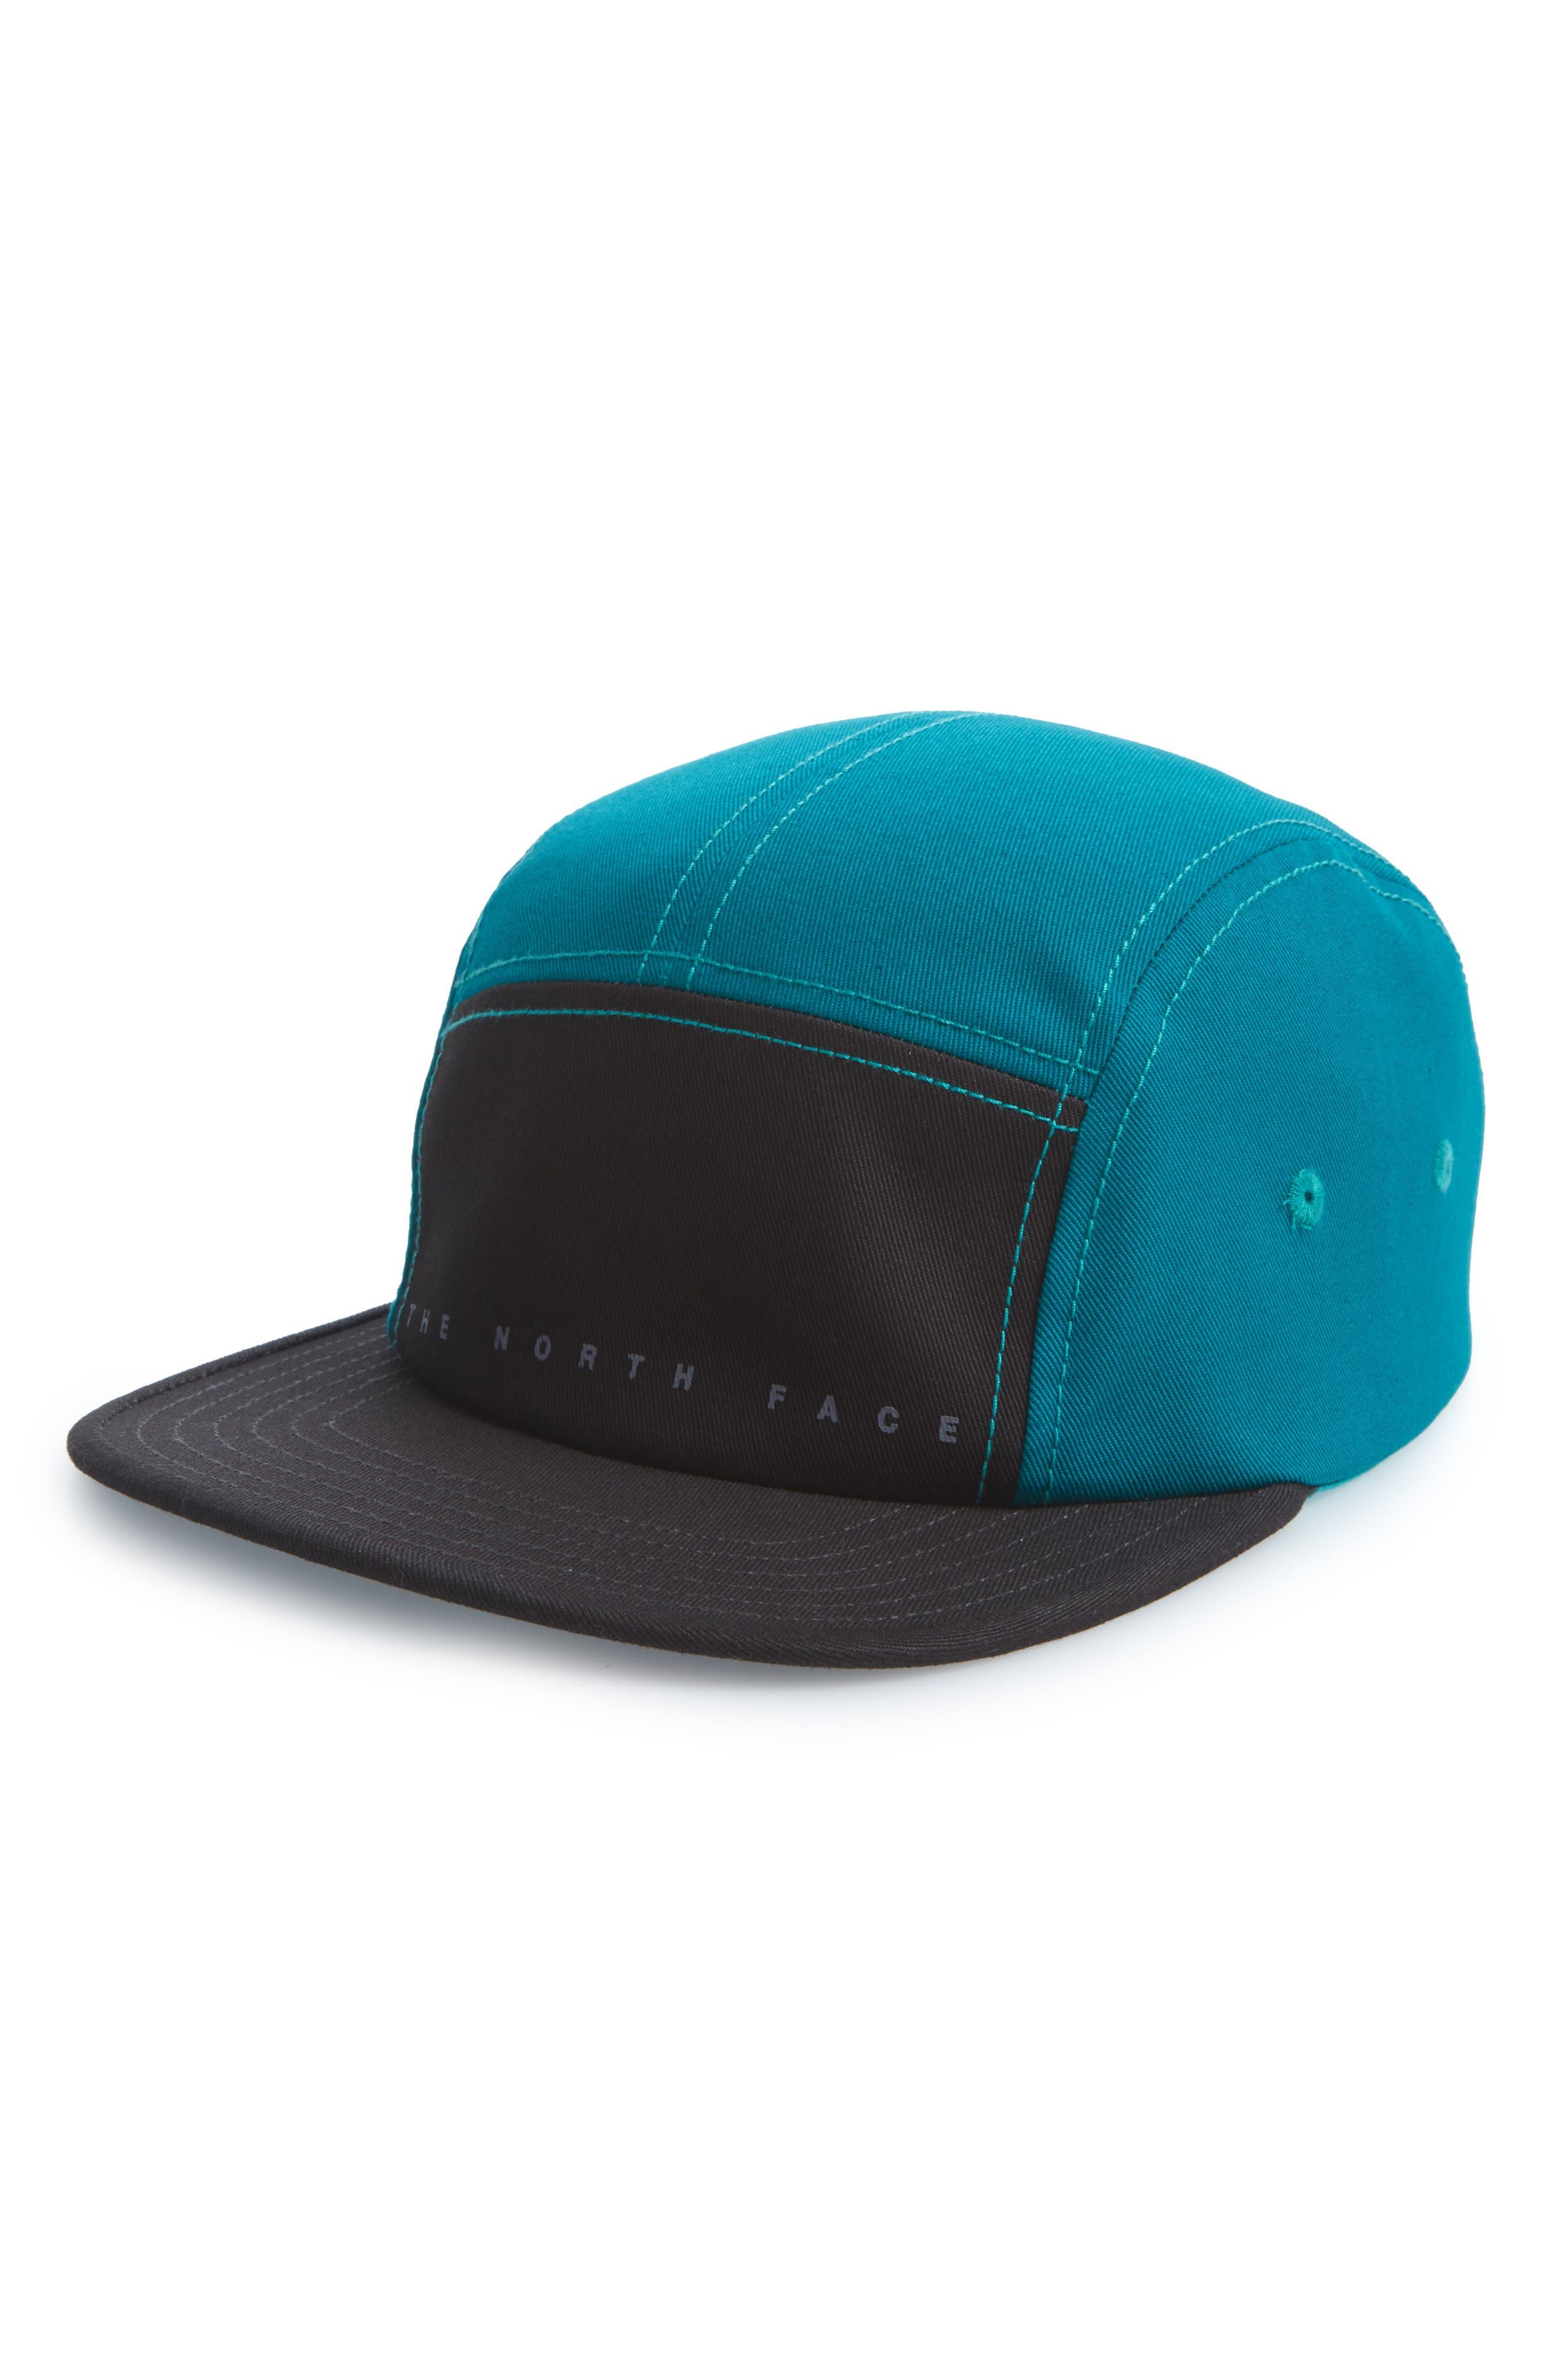 Five-Panel Baseball Cap,                             Main thumbnail 1, color,                             WEATHERED BLACK/ GREEN